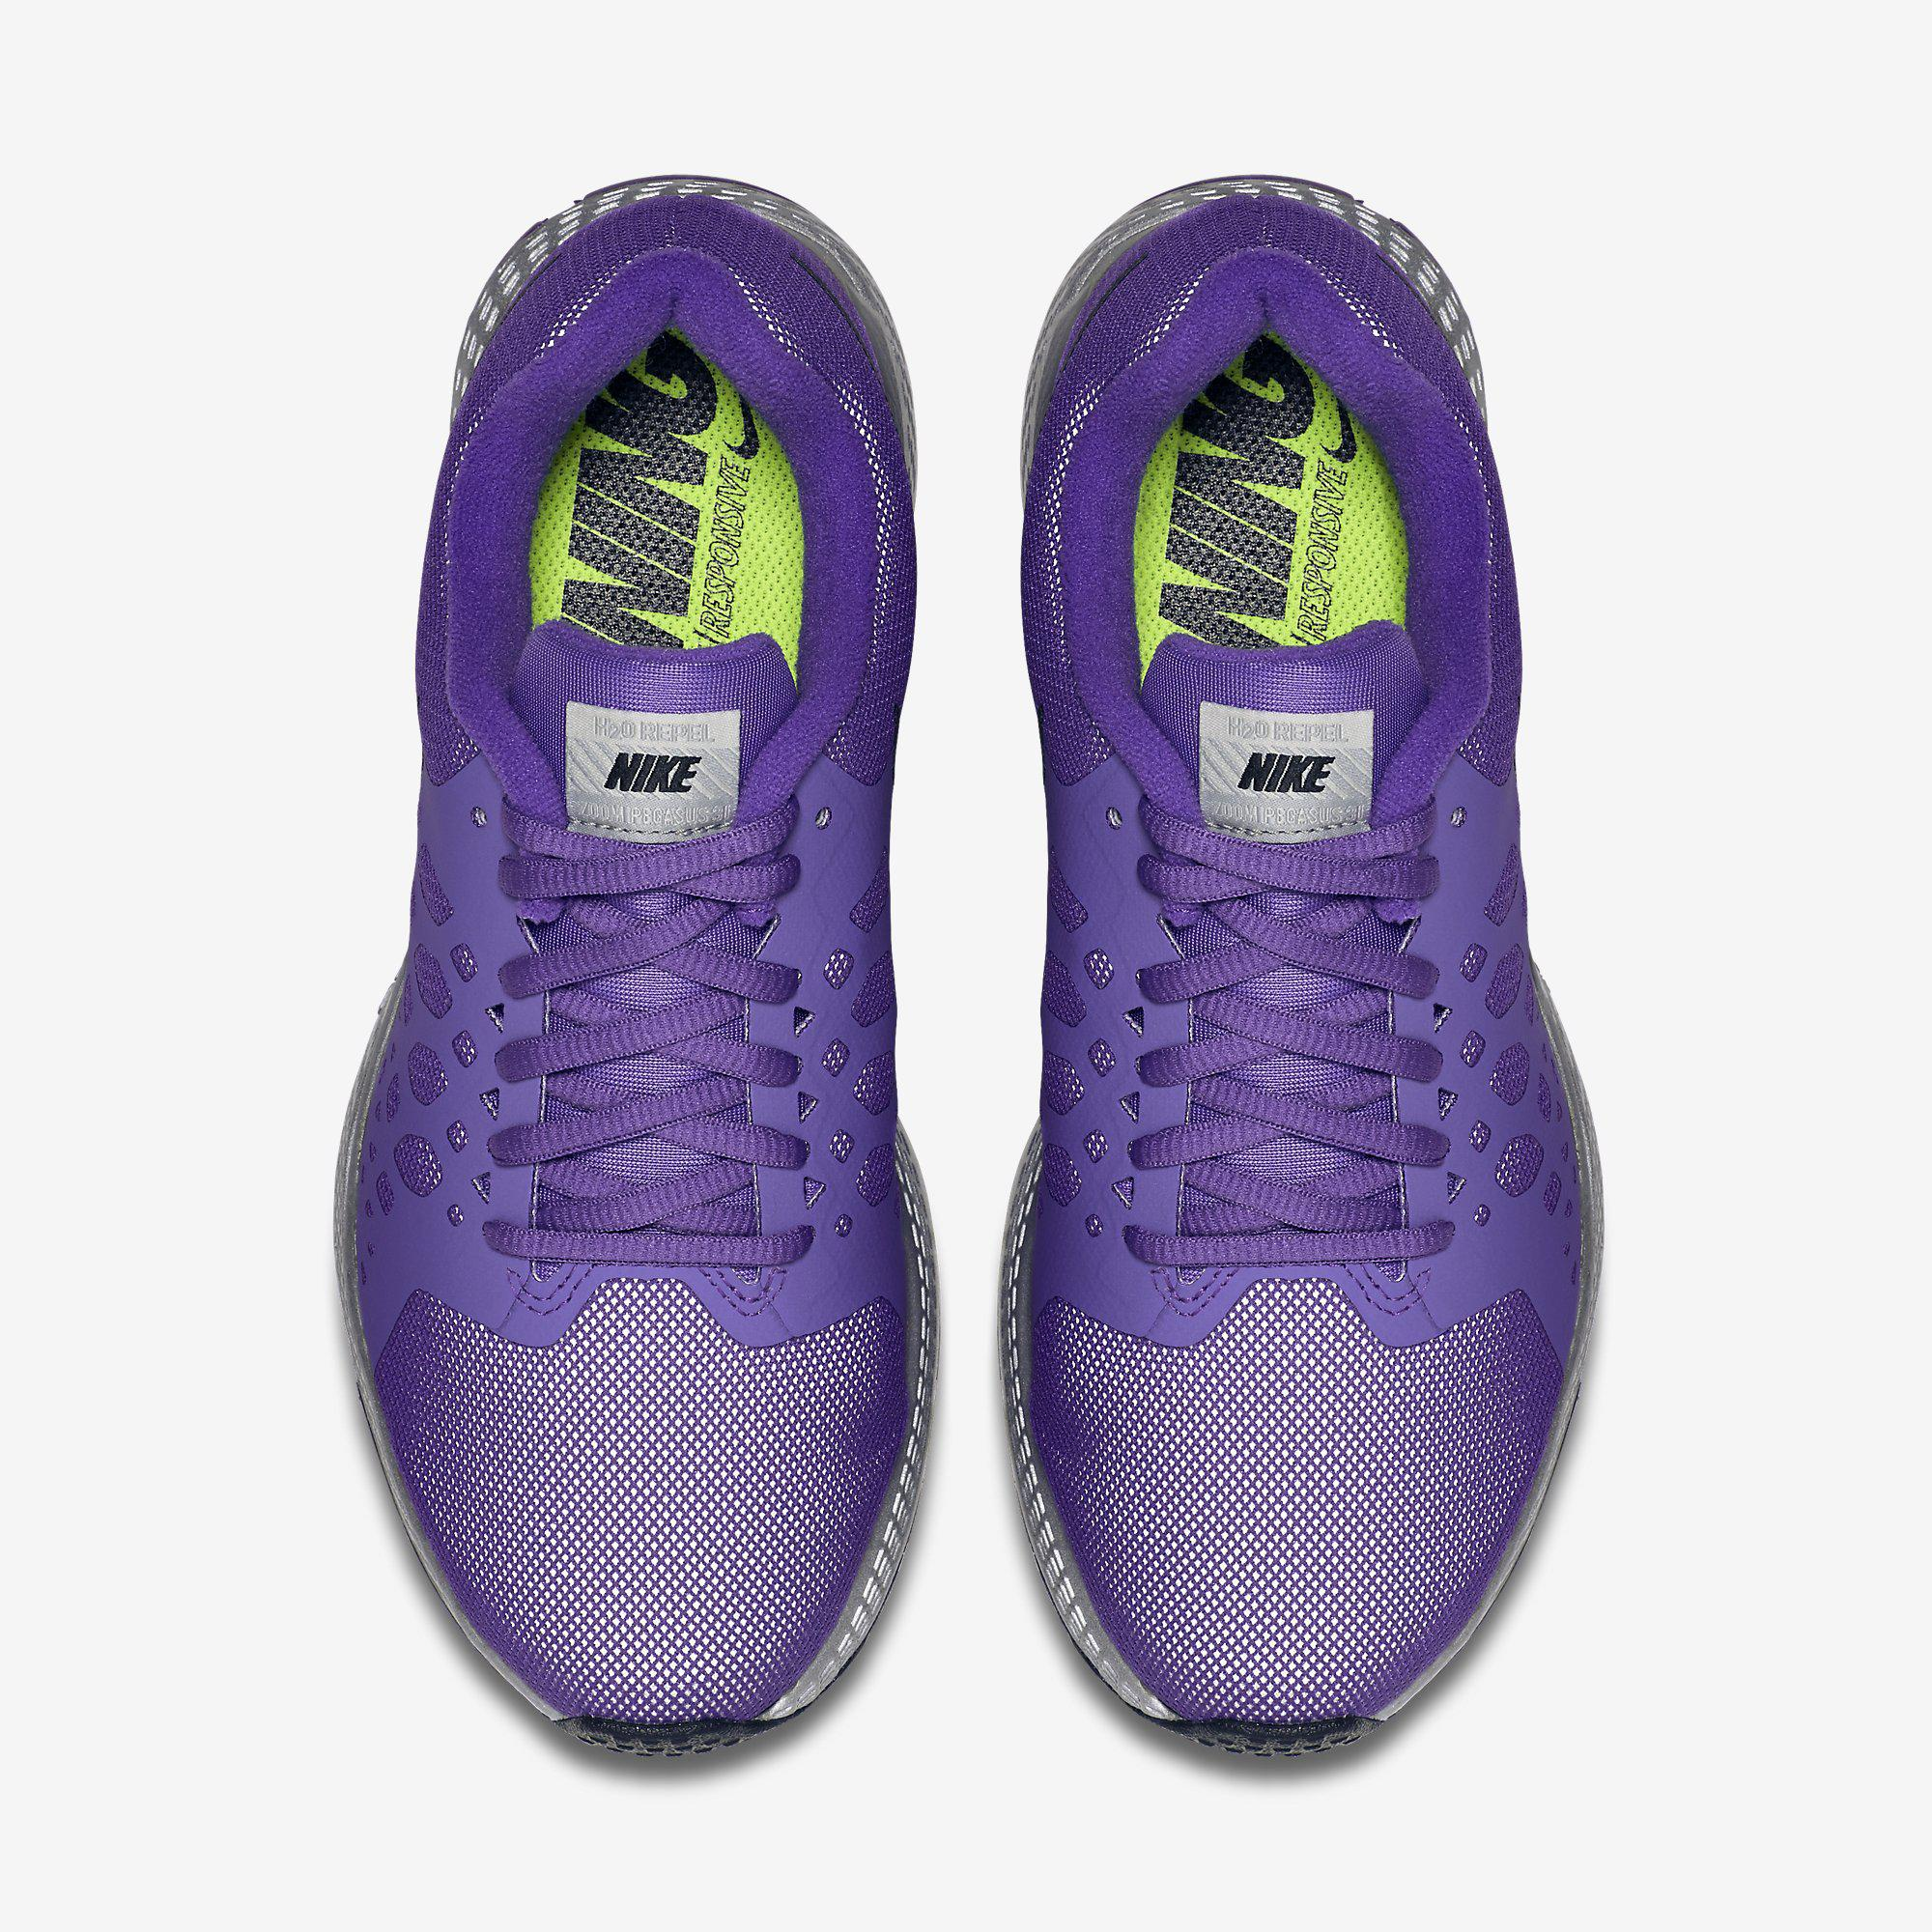 3836483aaaf Nike Womens Air Zoom Pegasus+ 31 Flash Running Shoes - Hyper Grape ...